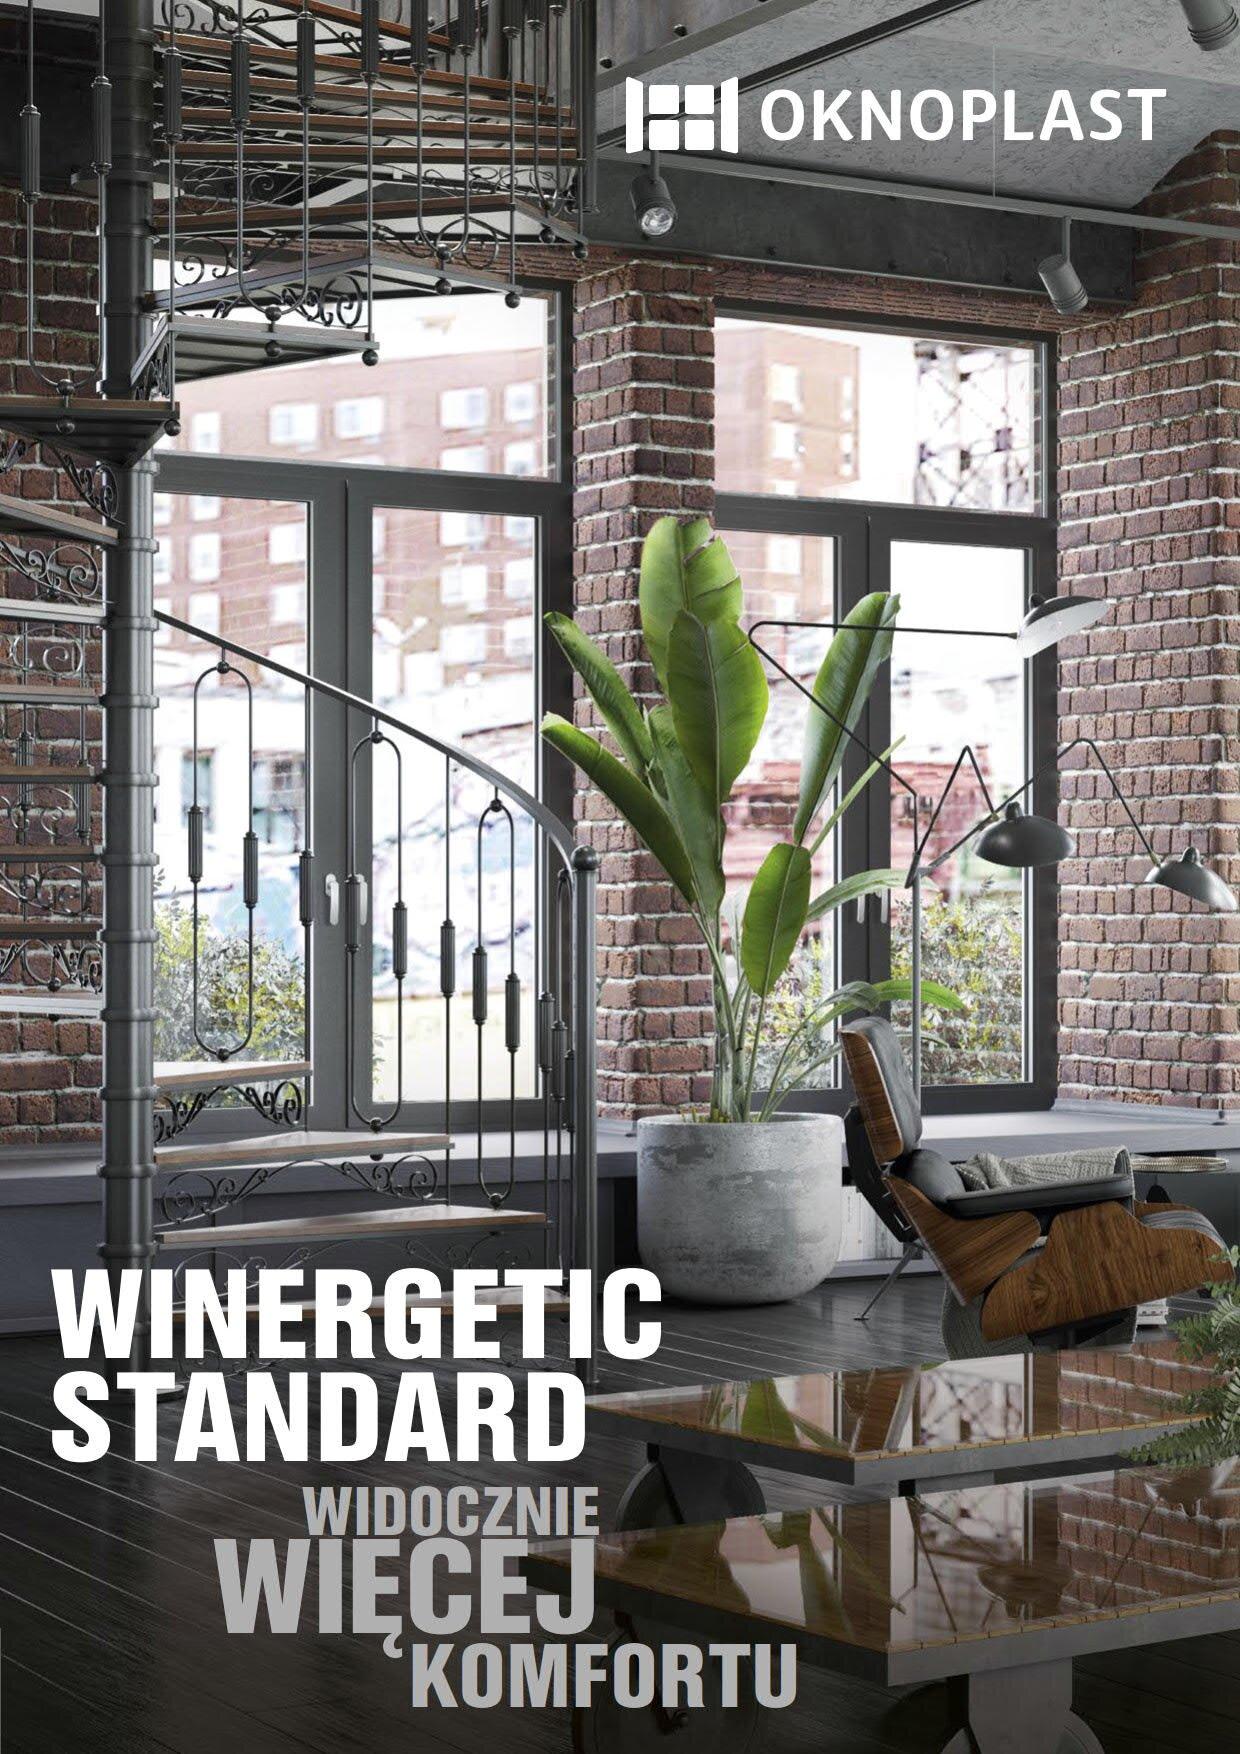 Winergetic Standard Image